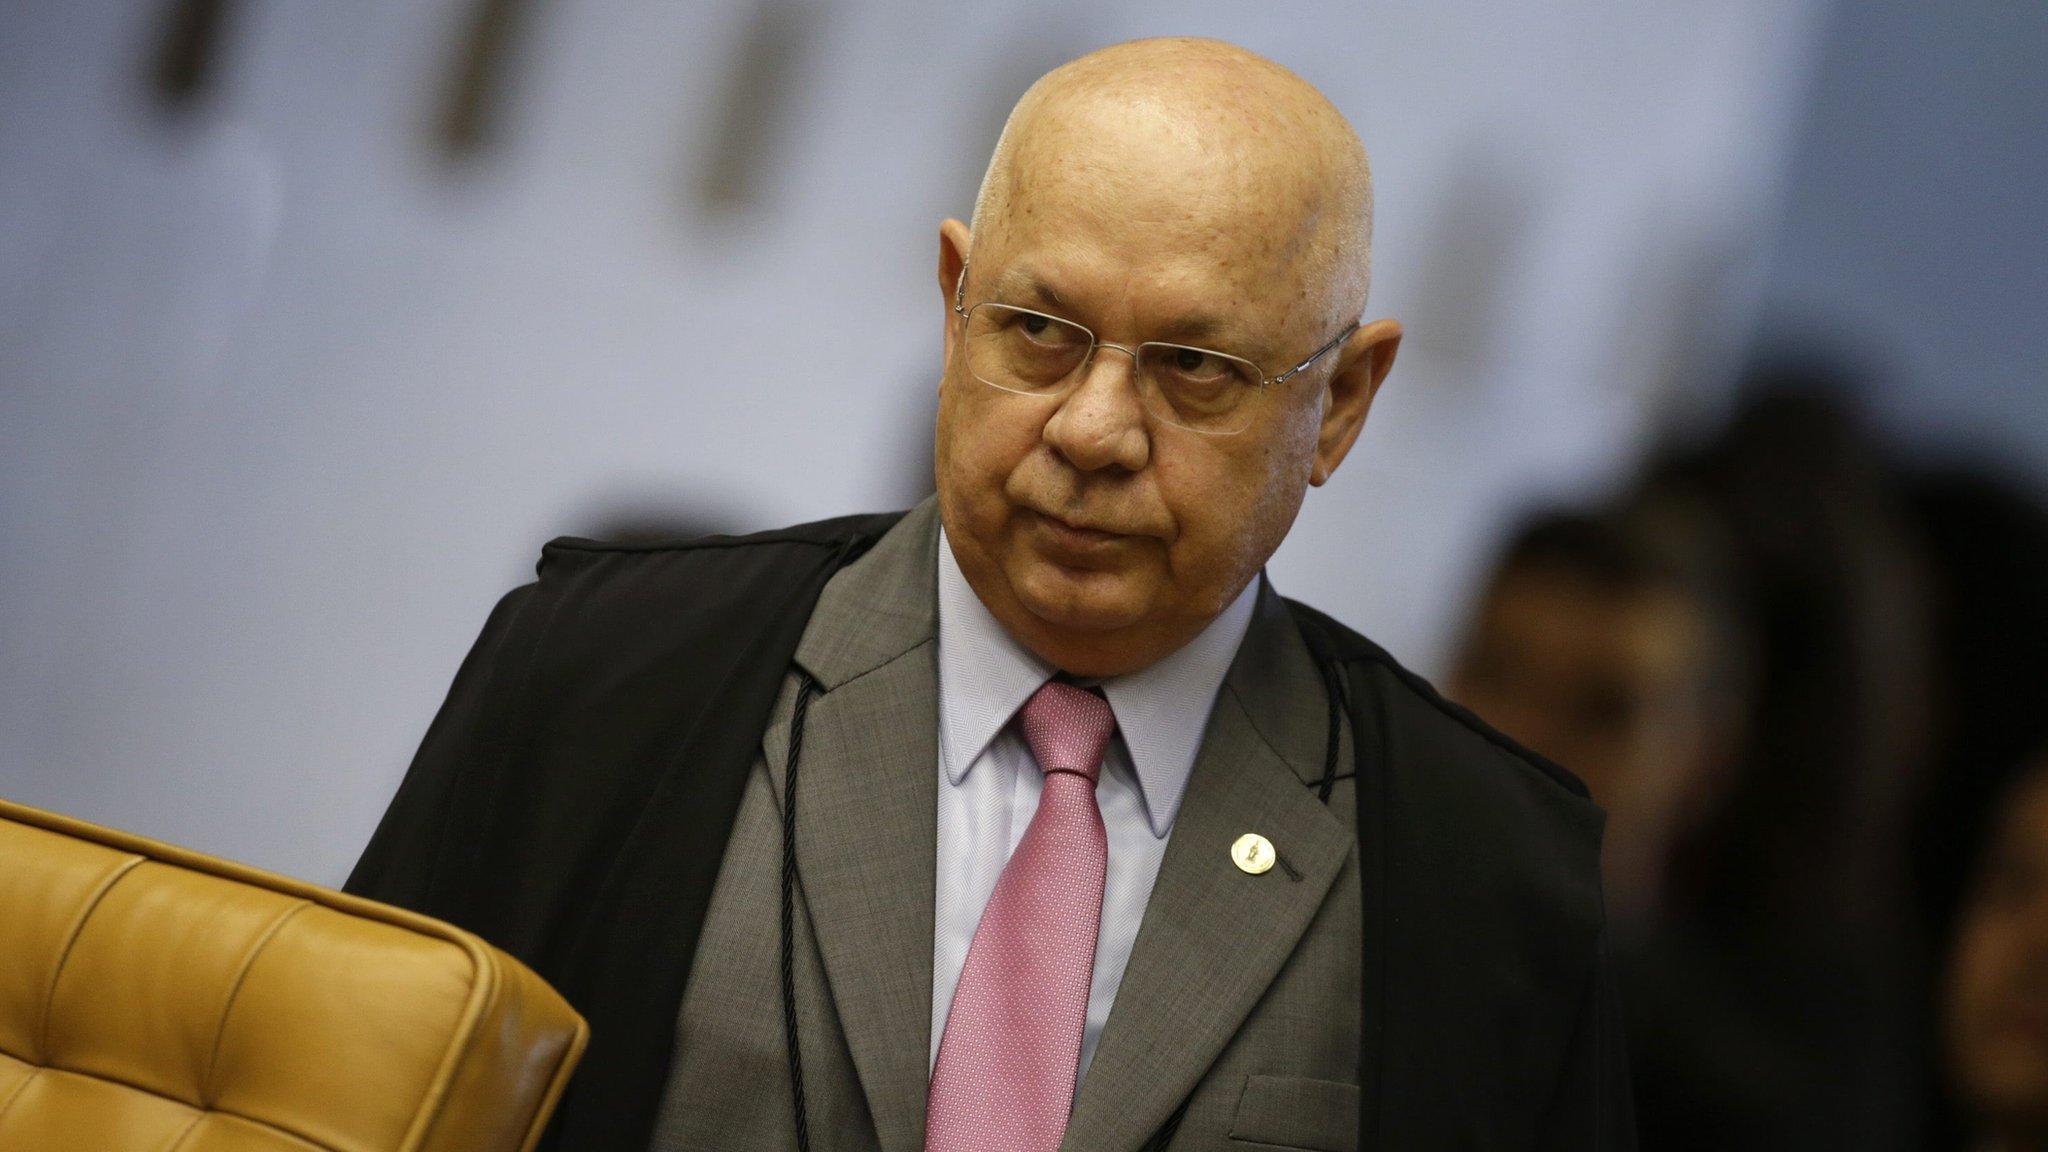 Petrobras fraud judge dies in plane crash